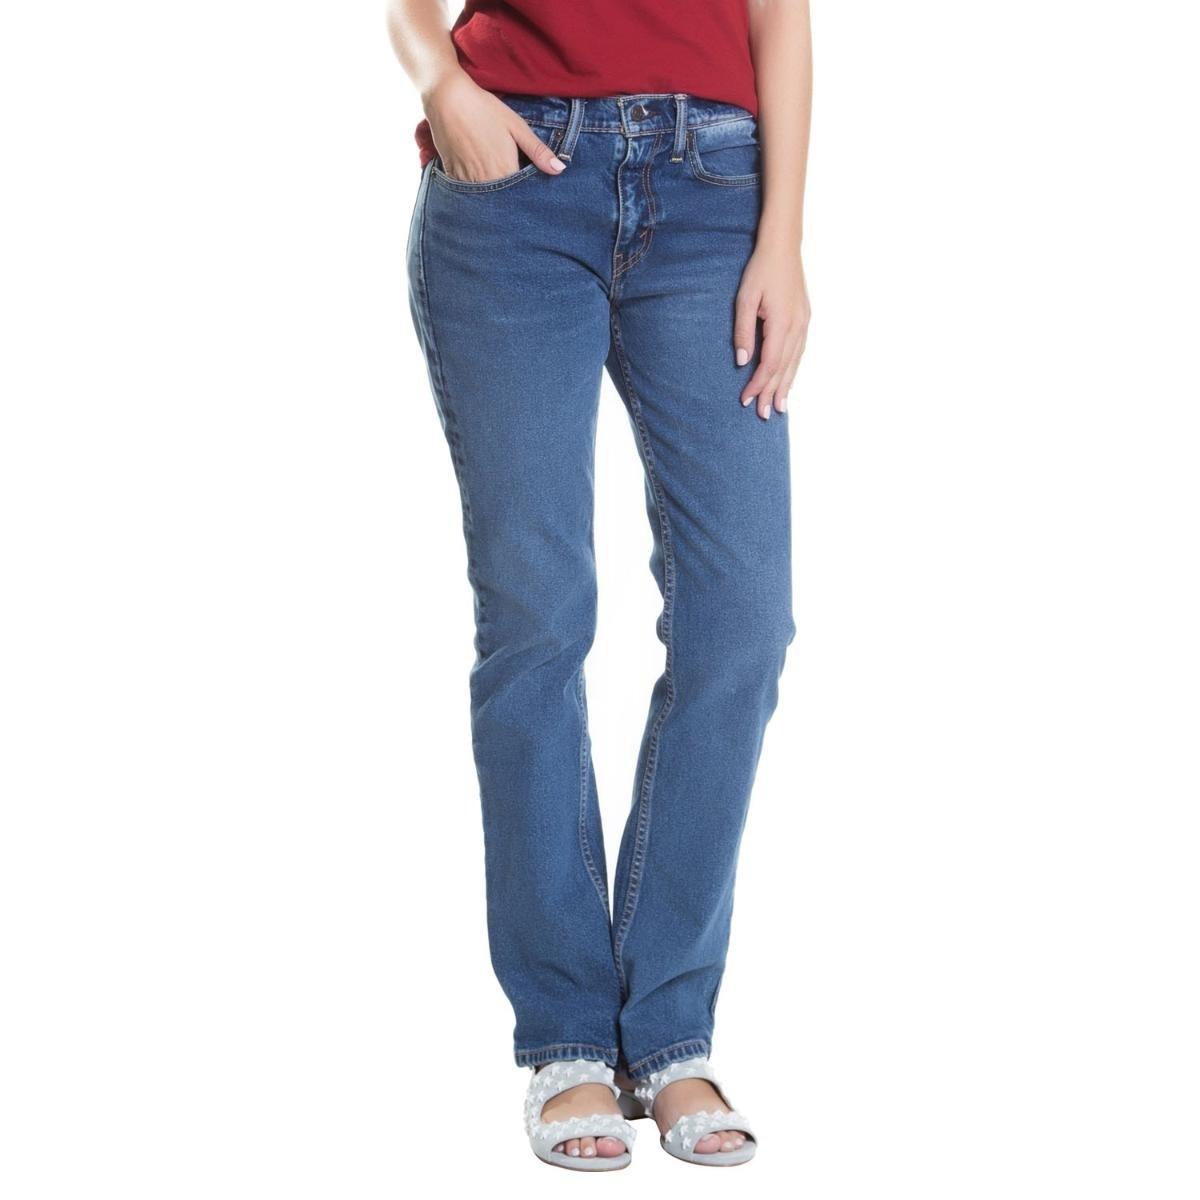 fbaa003f2 Calça Jeans Levi s 514 Straight Feminina - Compre Agora